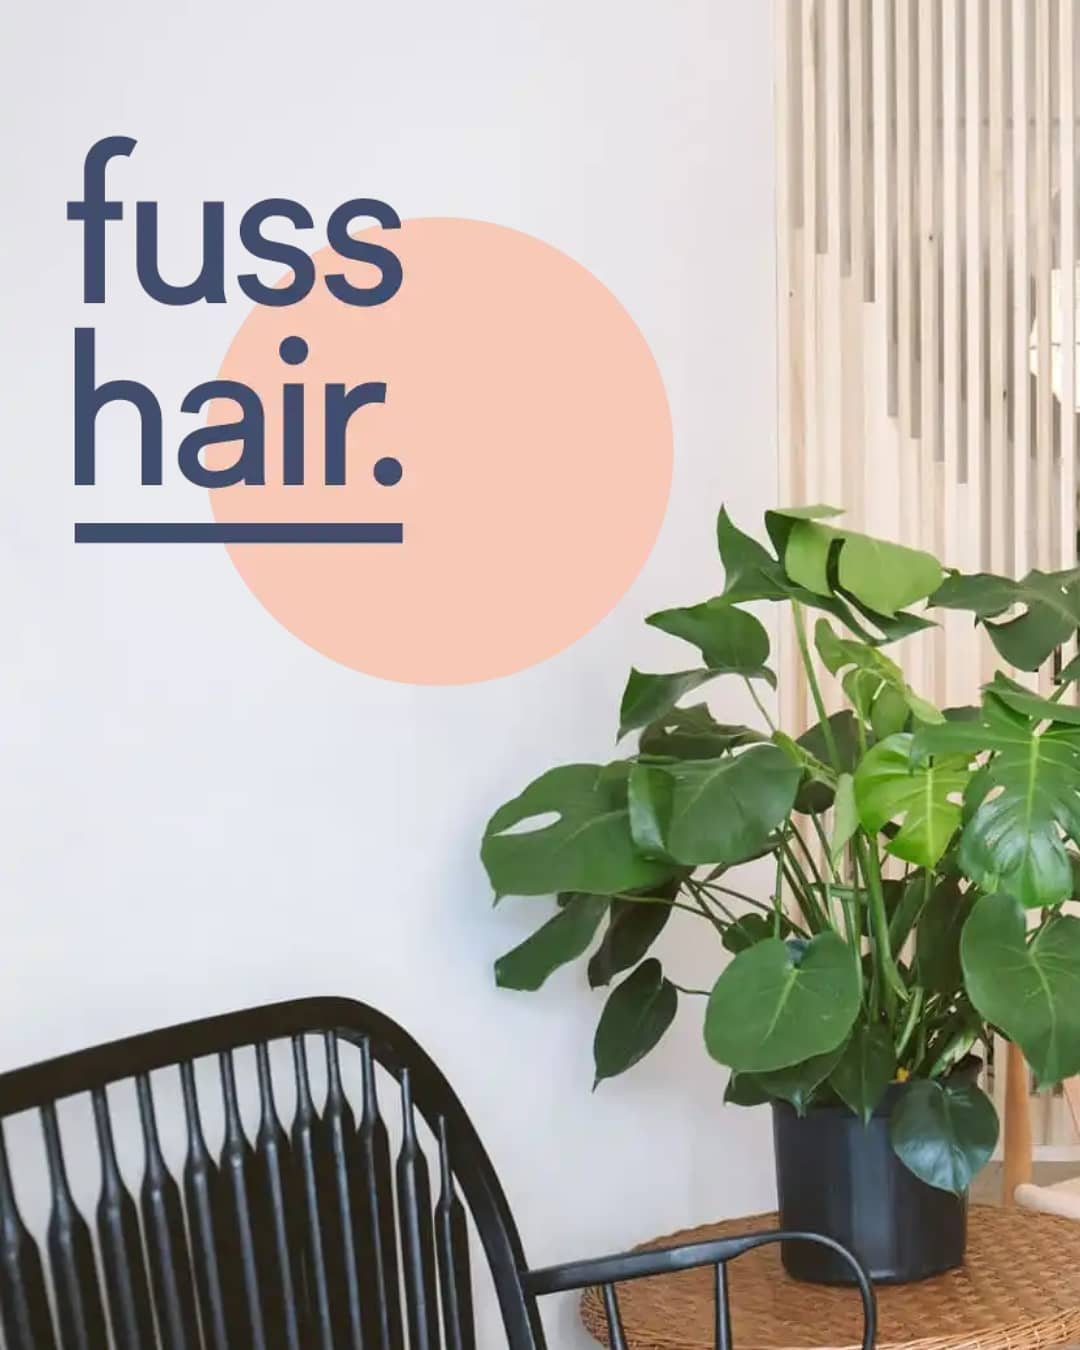 fuss hair @ 1022 Gerrard St. East, Toronto. @gofussyourself